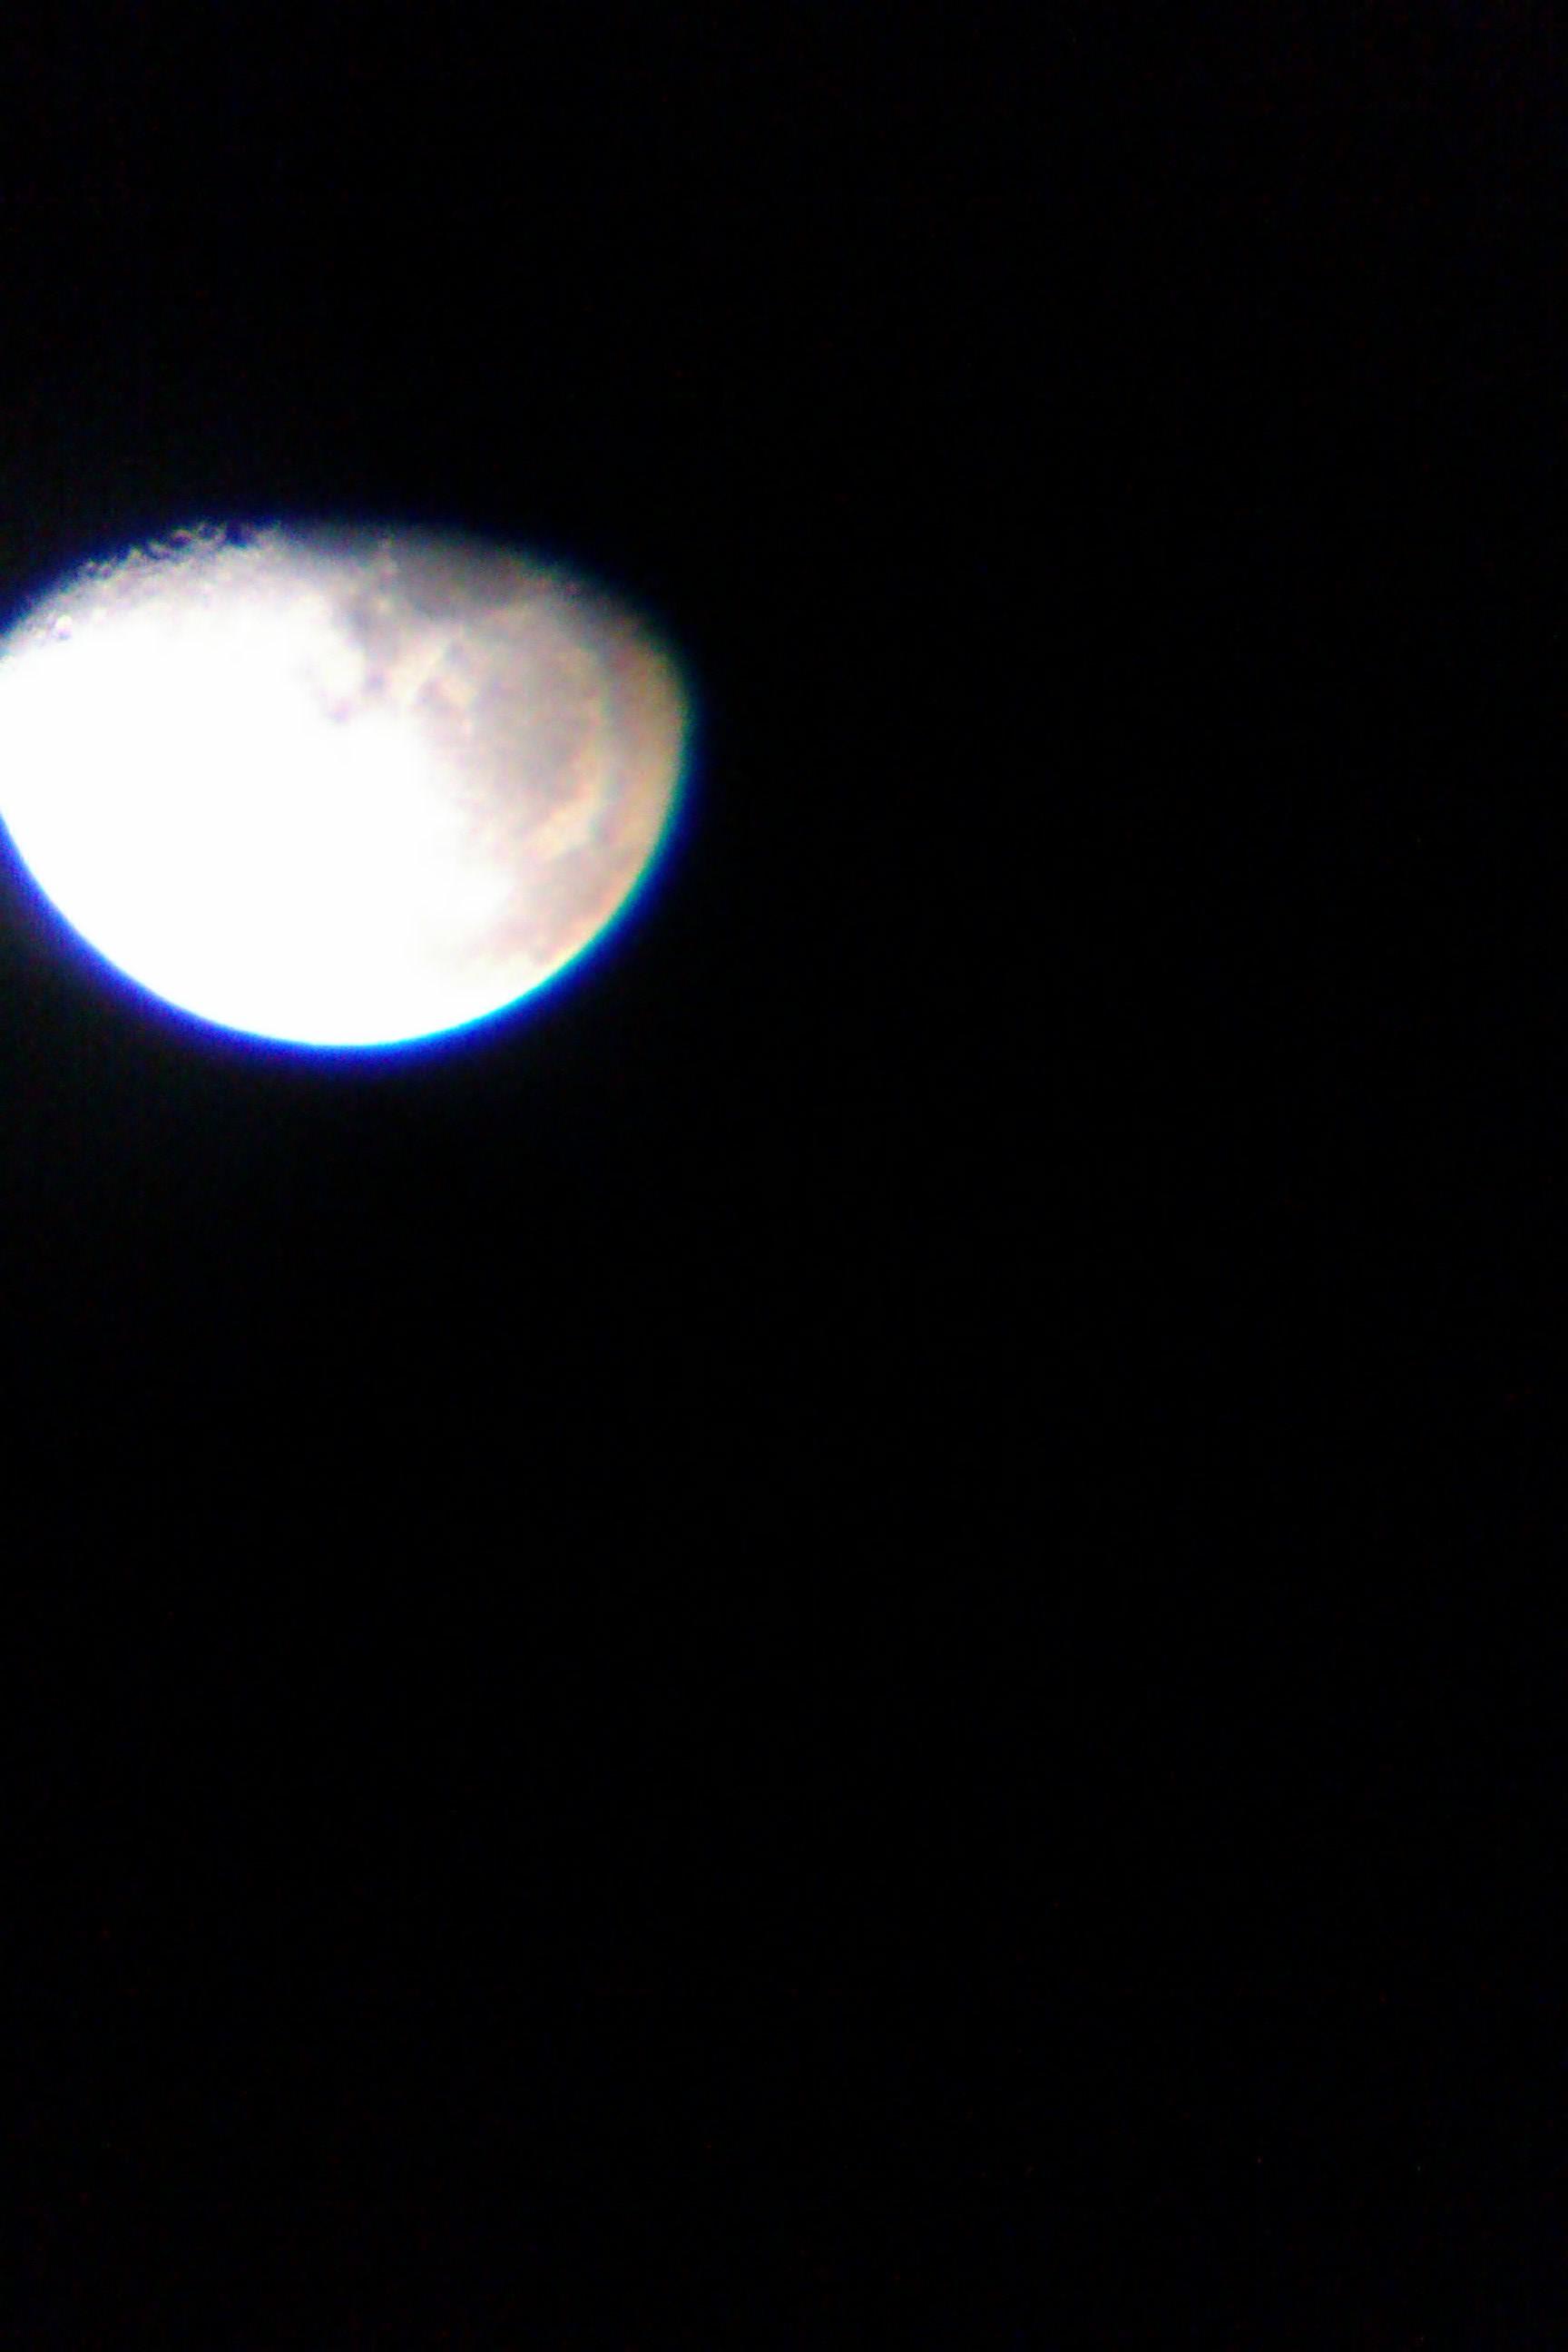 myblog.9e.cz/teleskop/M12.jpg